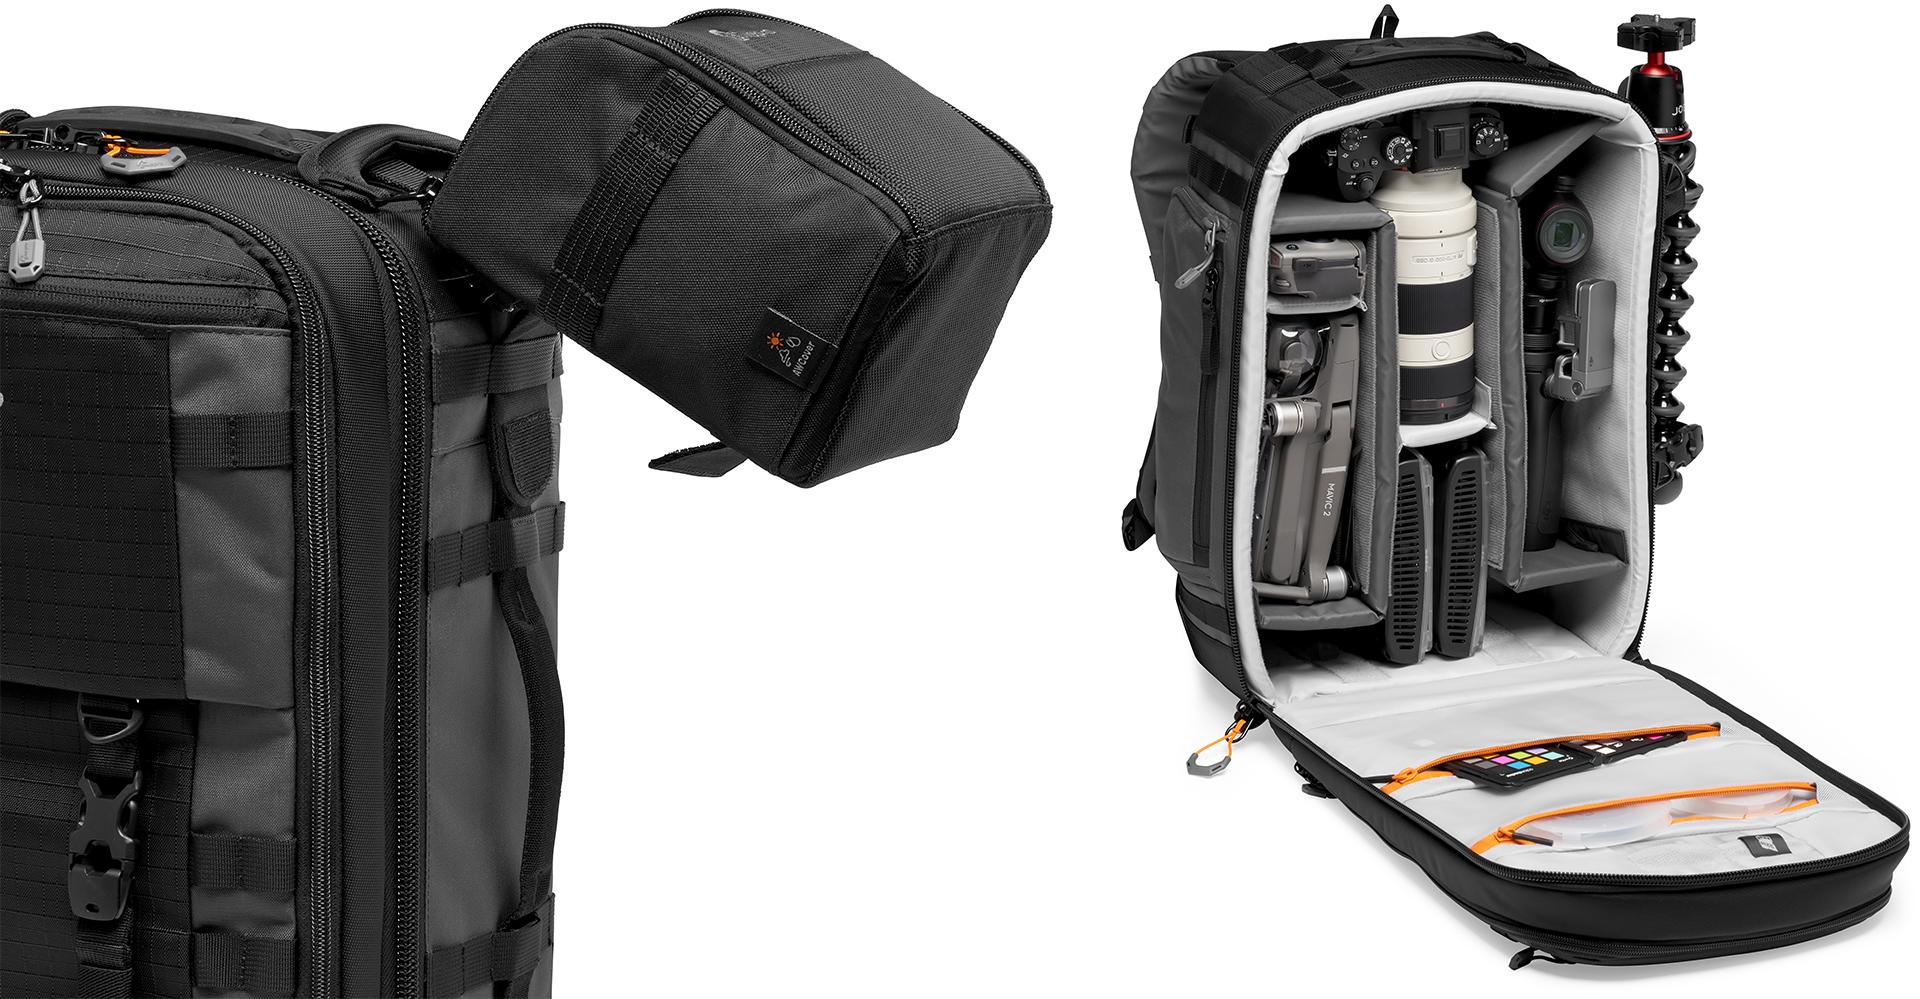 Lowepro Updates Pro Trekker Series with Four New Backpacks